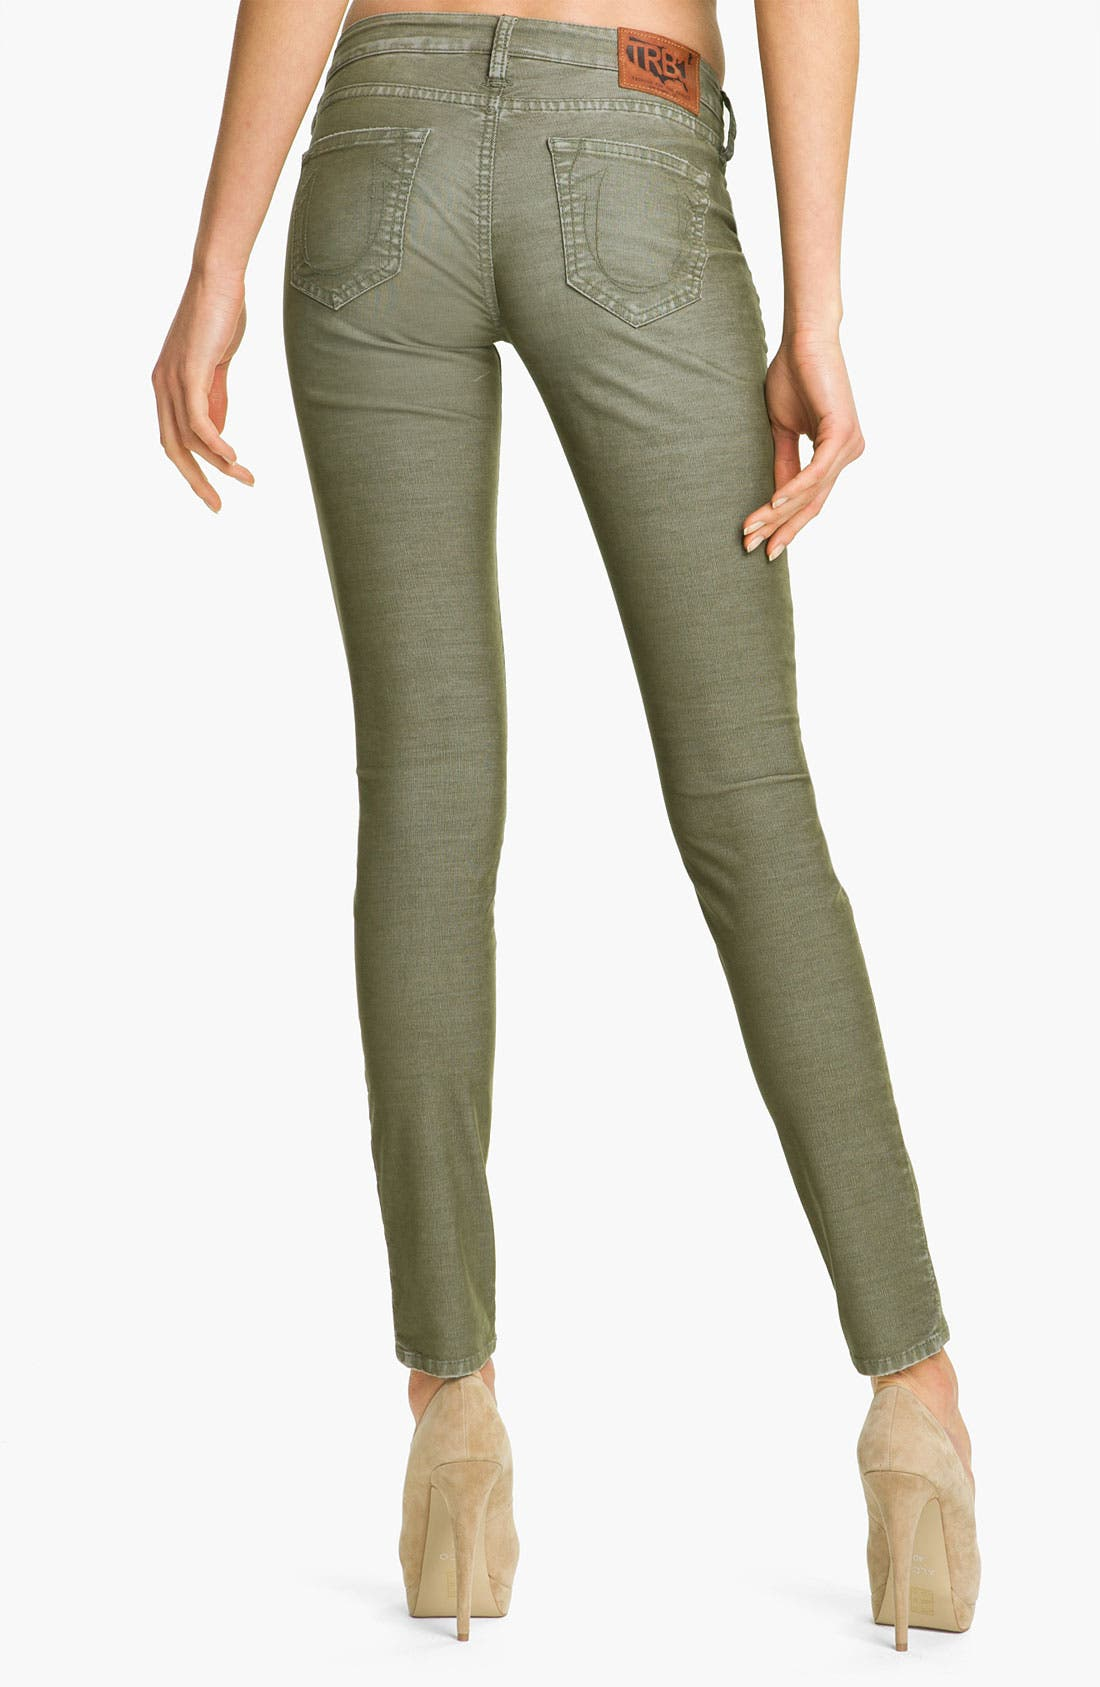 Main Image - True Religion Brand Jeans 'Shannon' Skinny Corduroy Pants